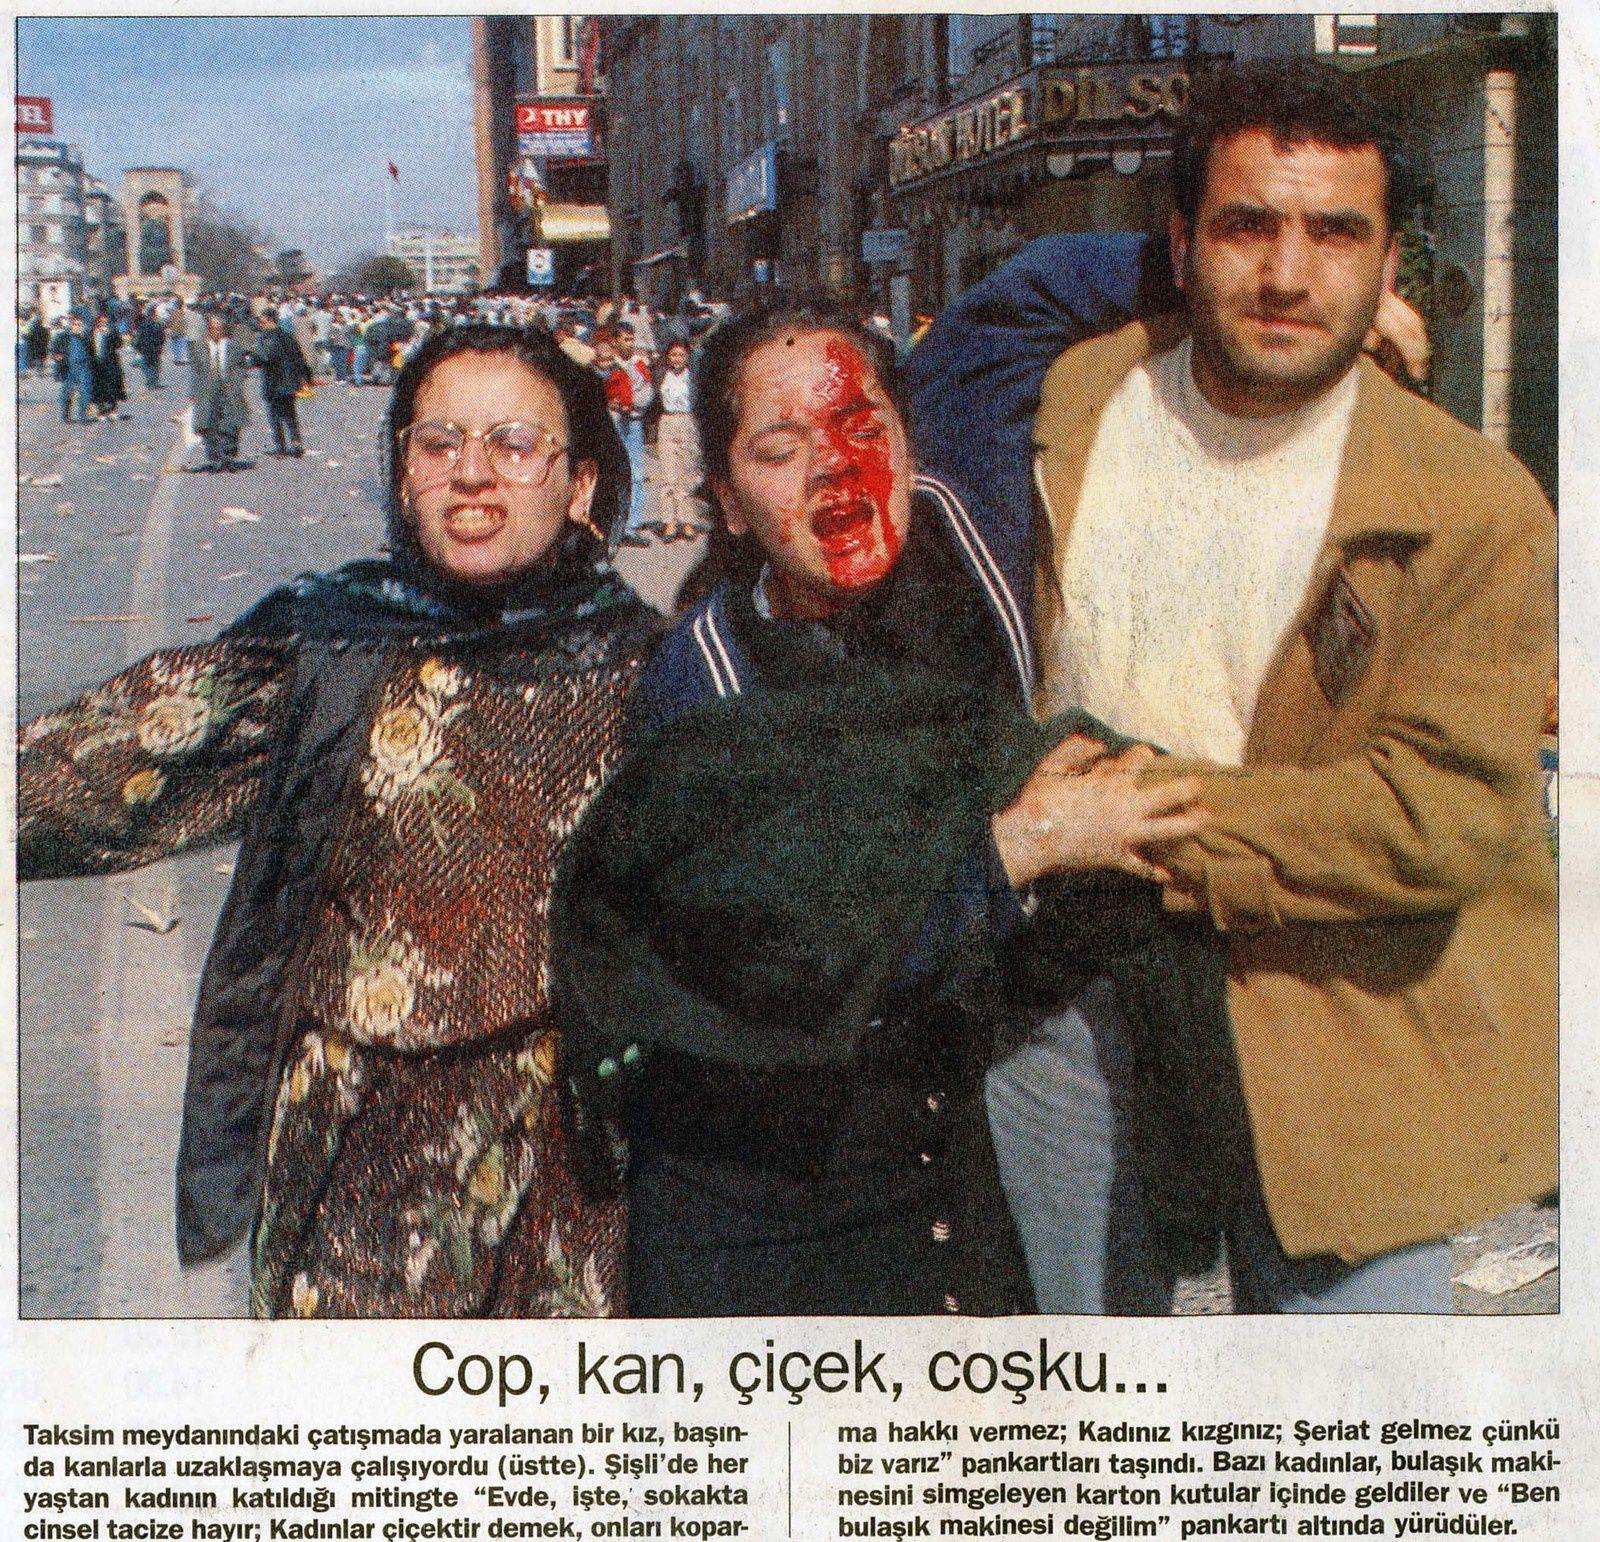 Milliyet, 9 mars 1998